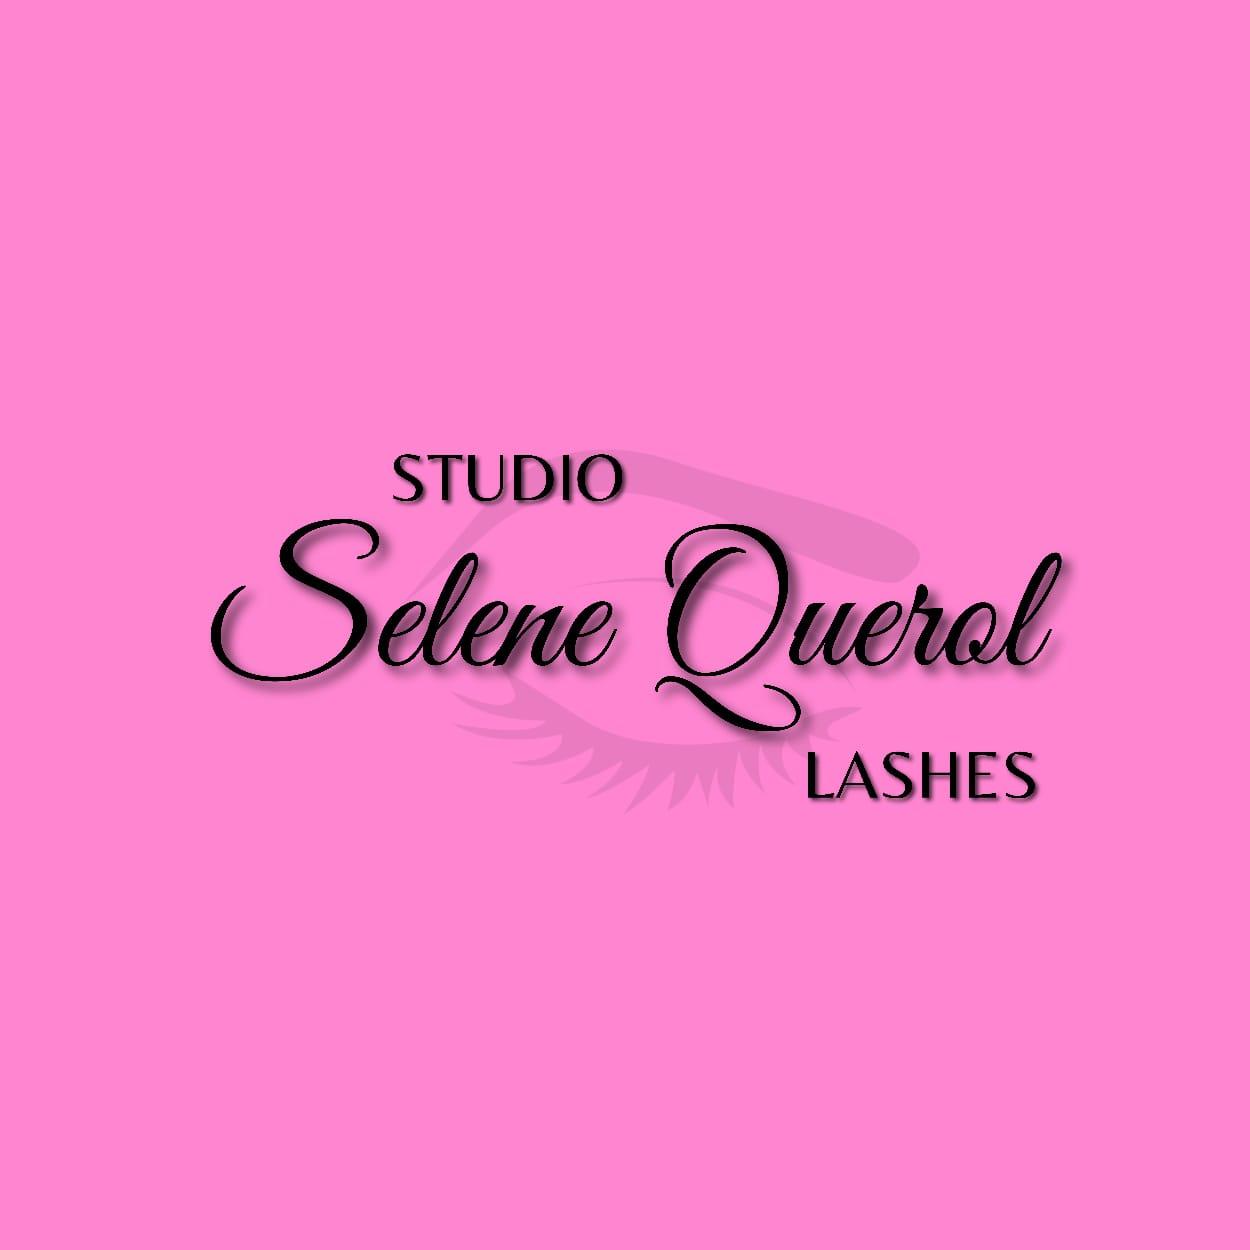 Studio Selene Querol Lashes